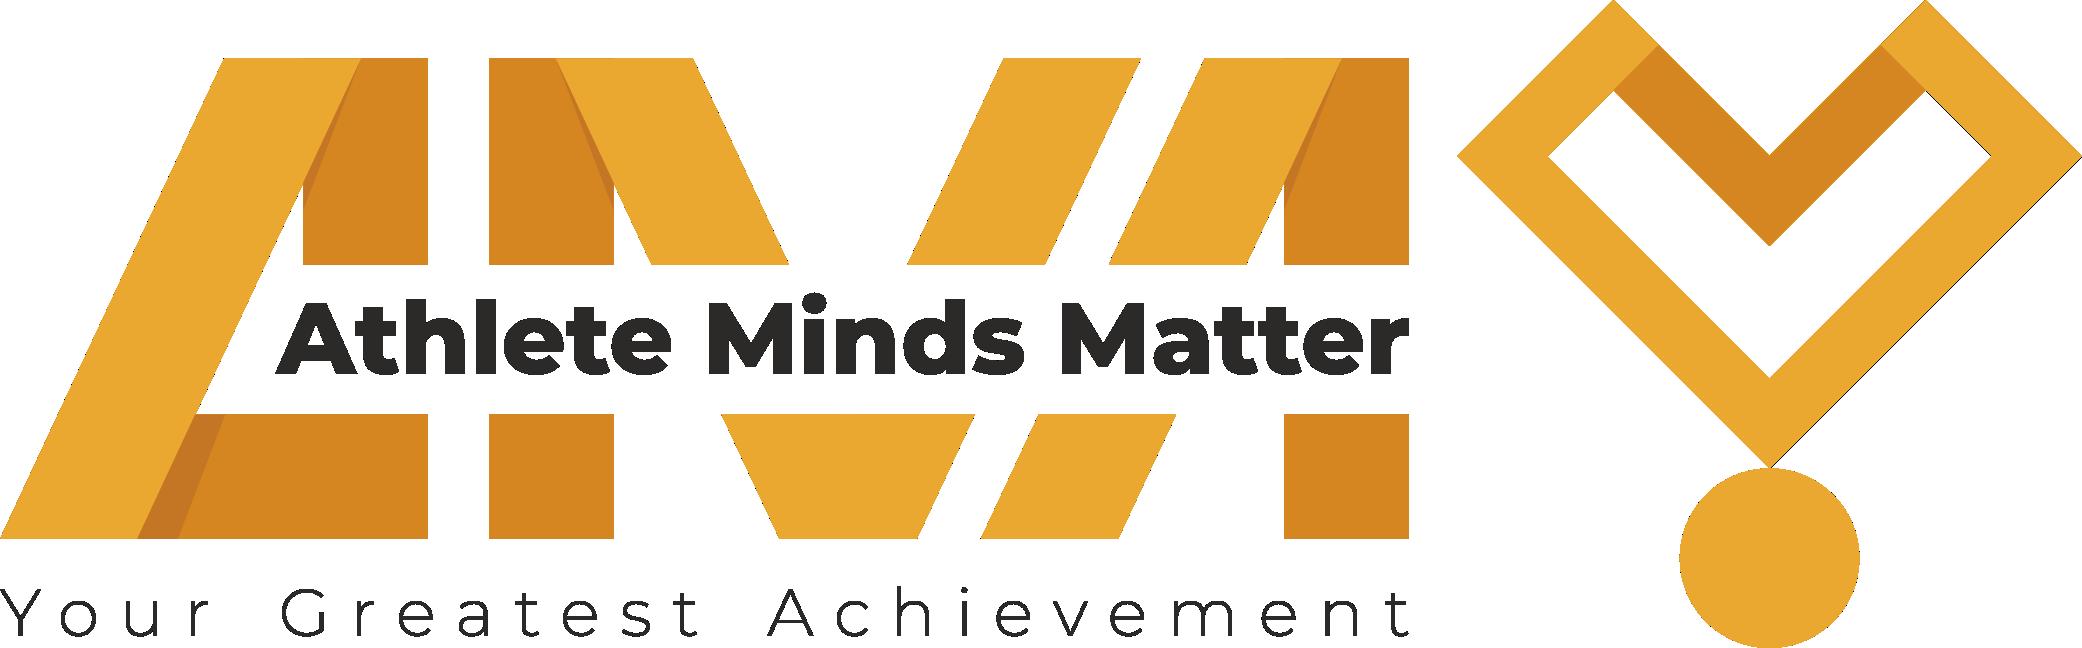 Athlete Minds Matter